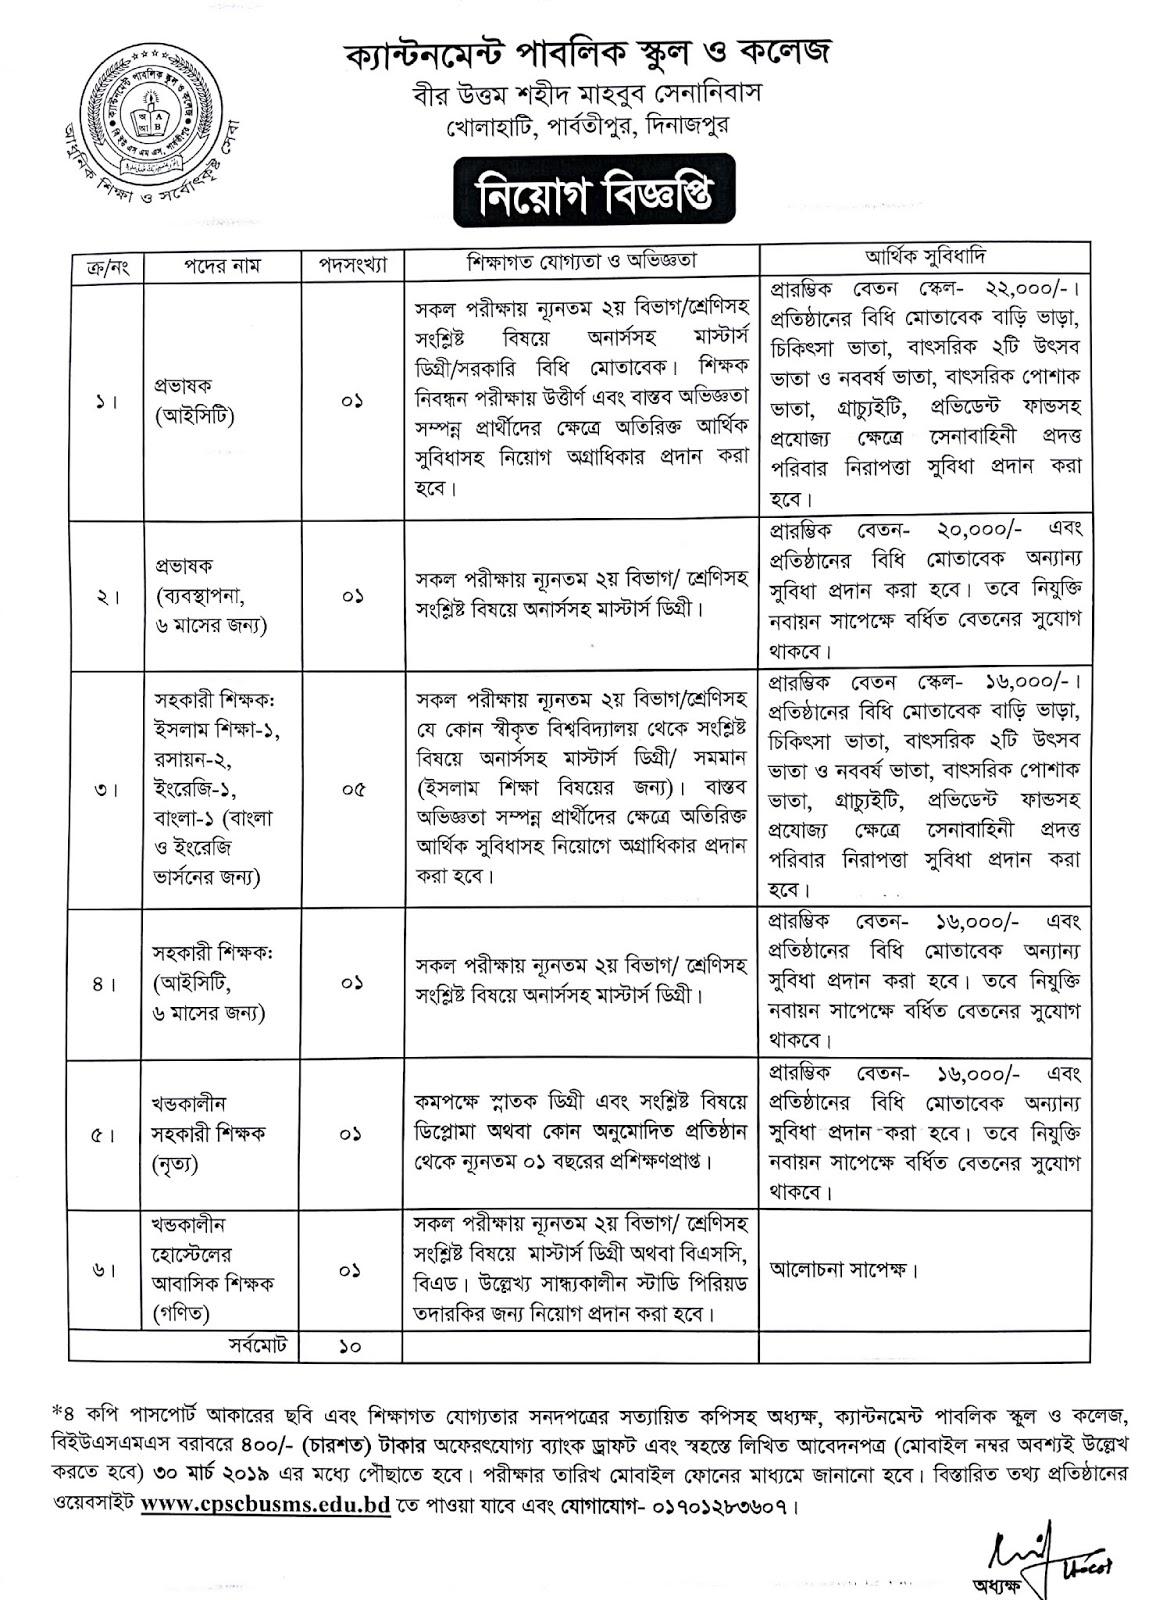 Cantonment Public School & College, Dinajpur Job Circular 2019